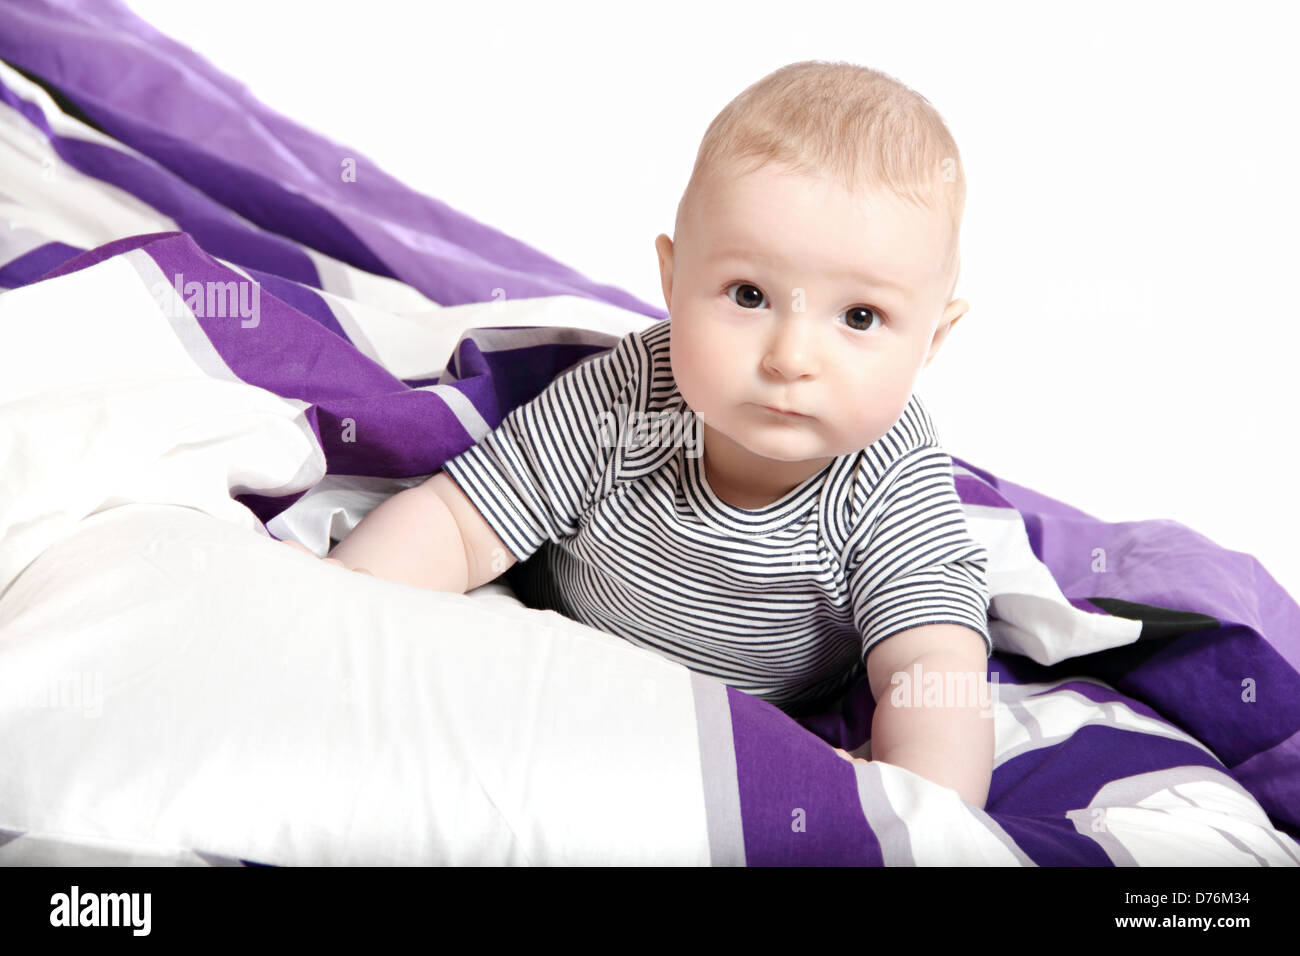 Toddler on bed under blanket - Stock Image